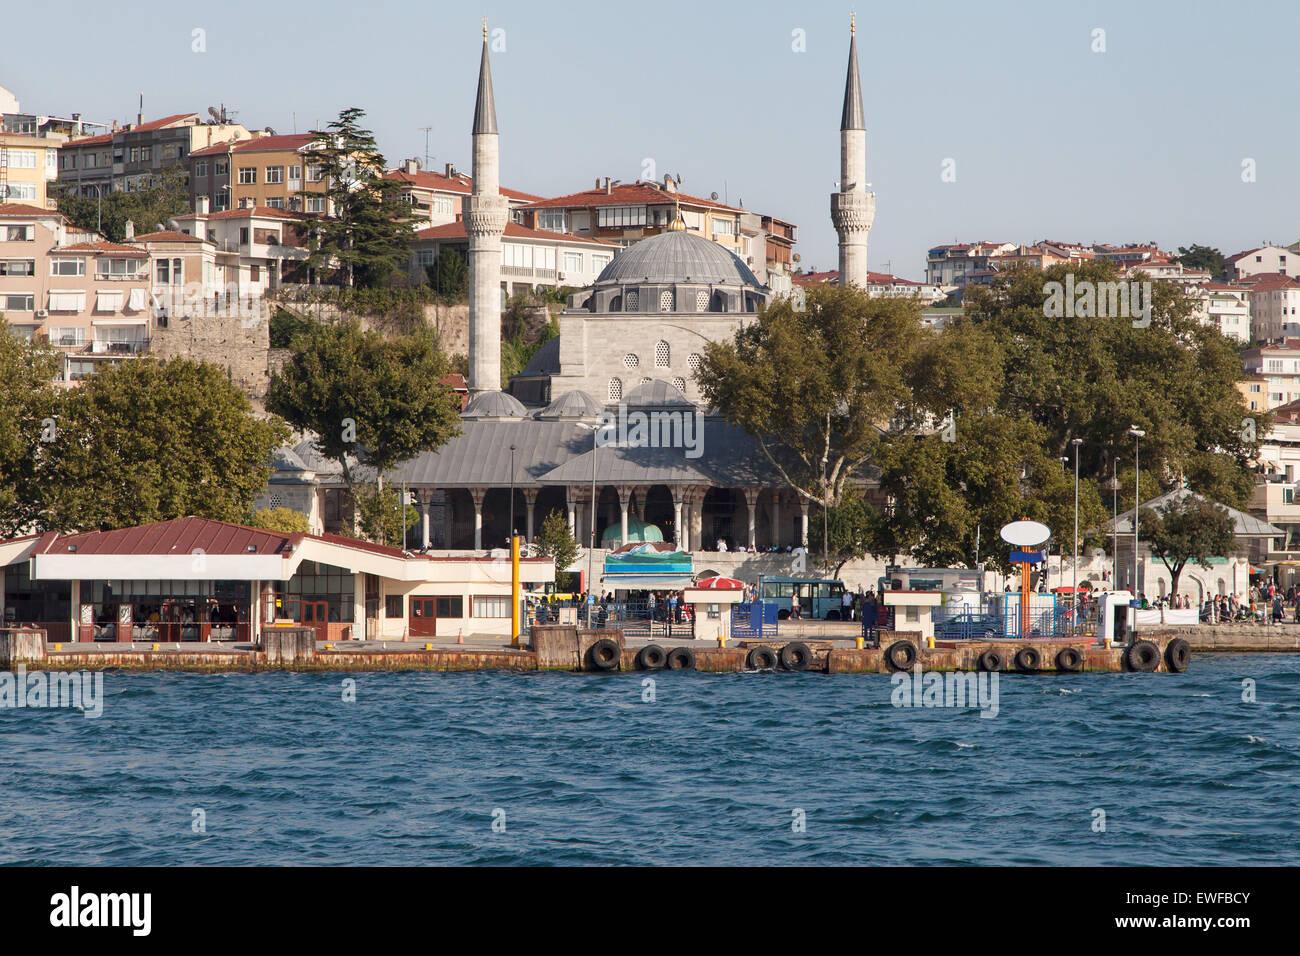 Uskudar pier in Istanbul, Turkey. - Stock Image